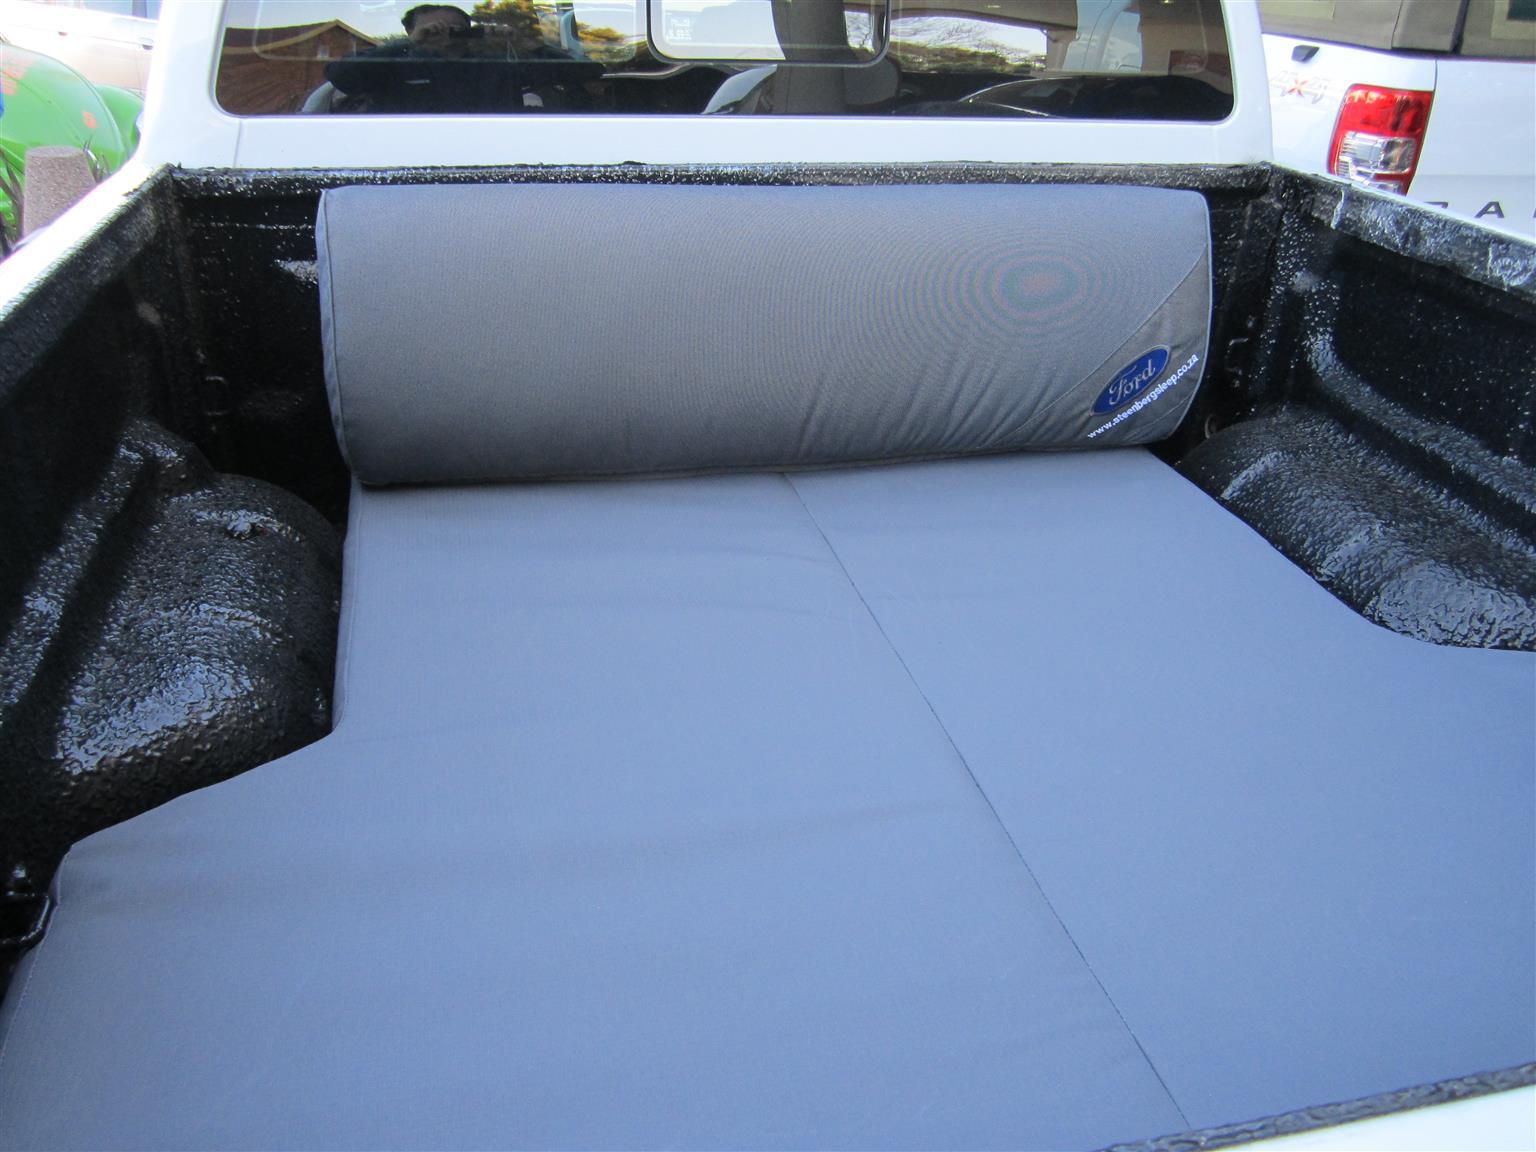 Bakkie mattresses